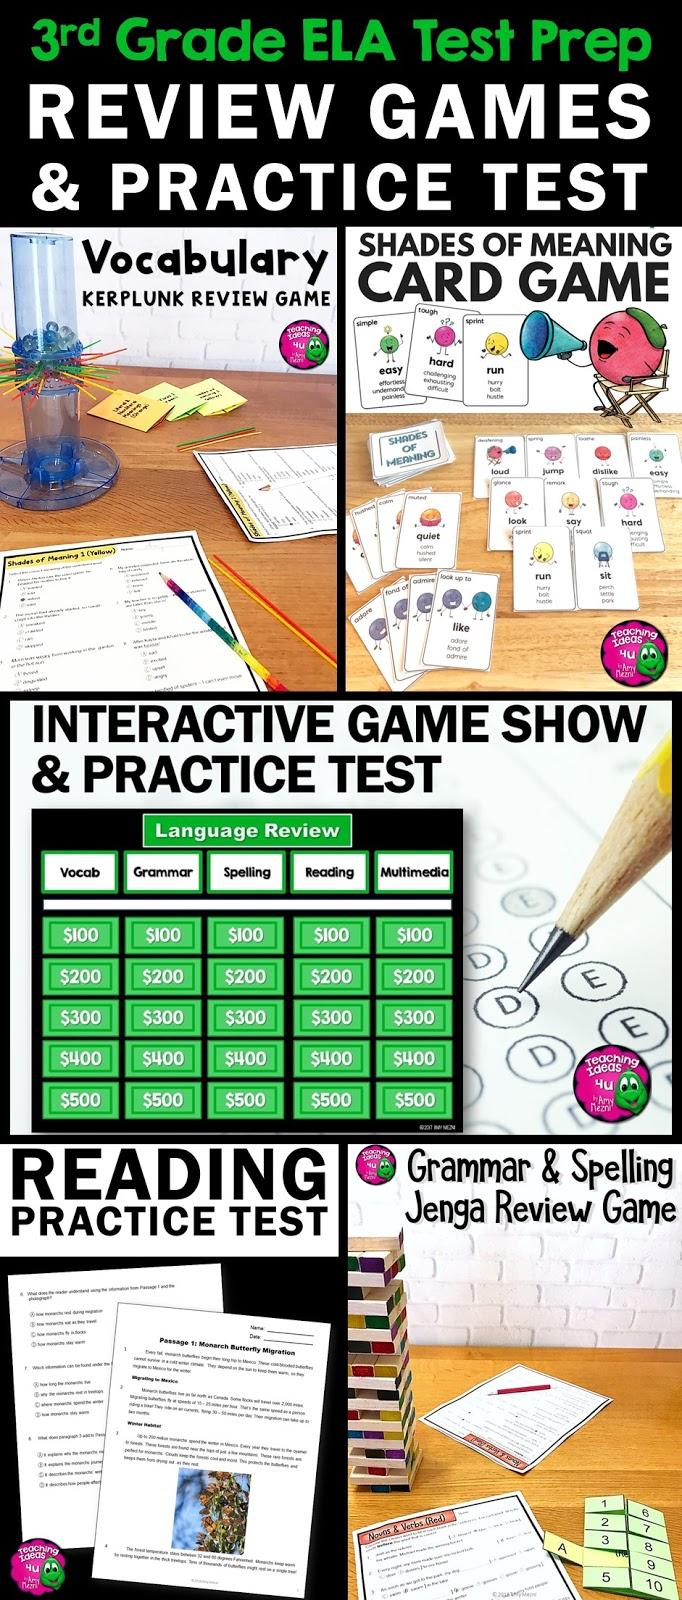 How To Prep For Fsa Valuable Tips For 3rd Grade Ela Teaching